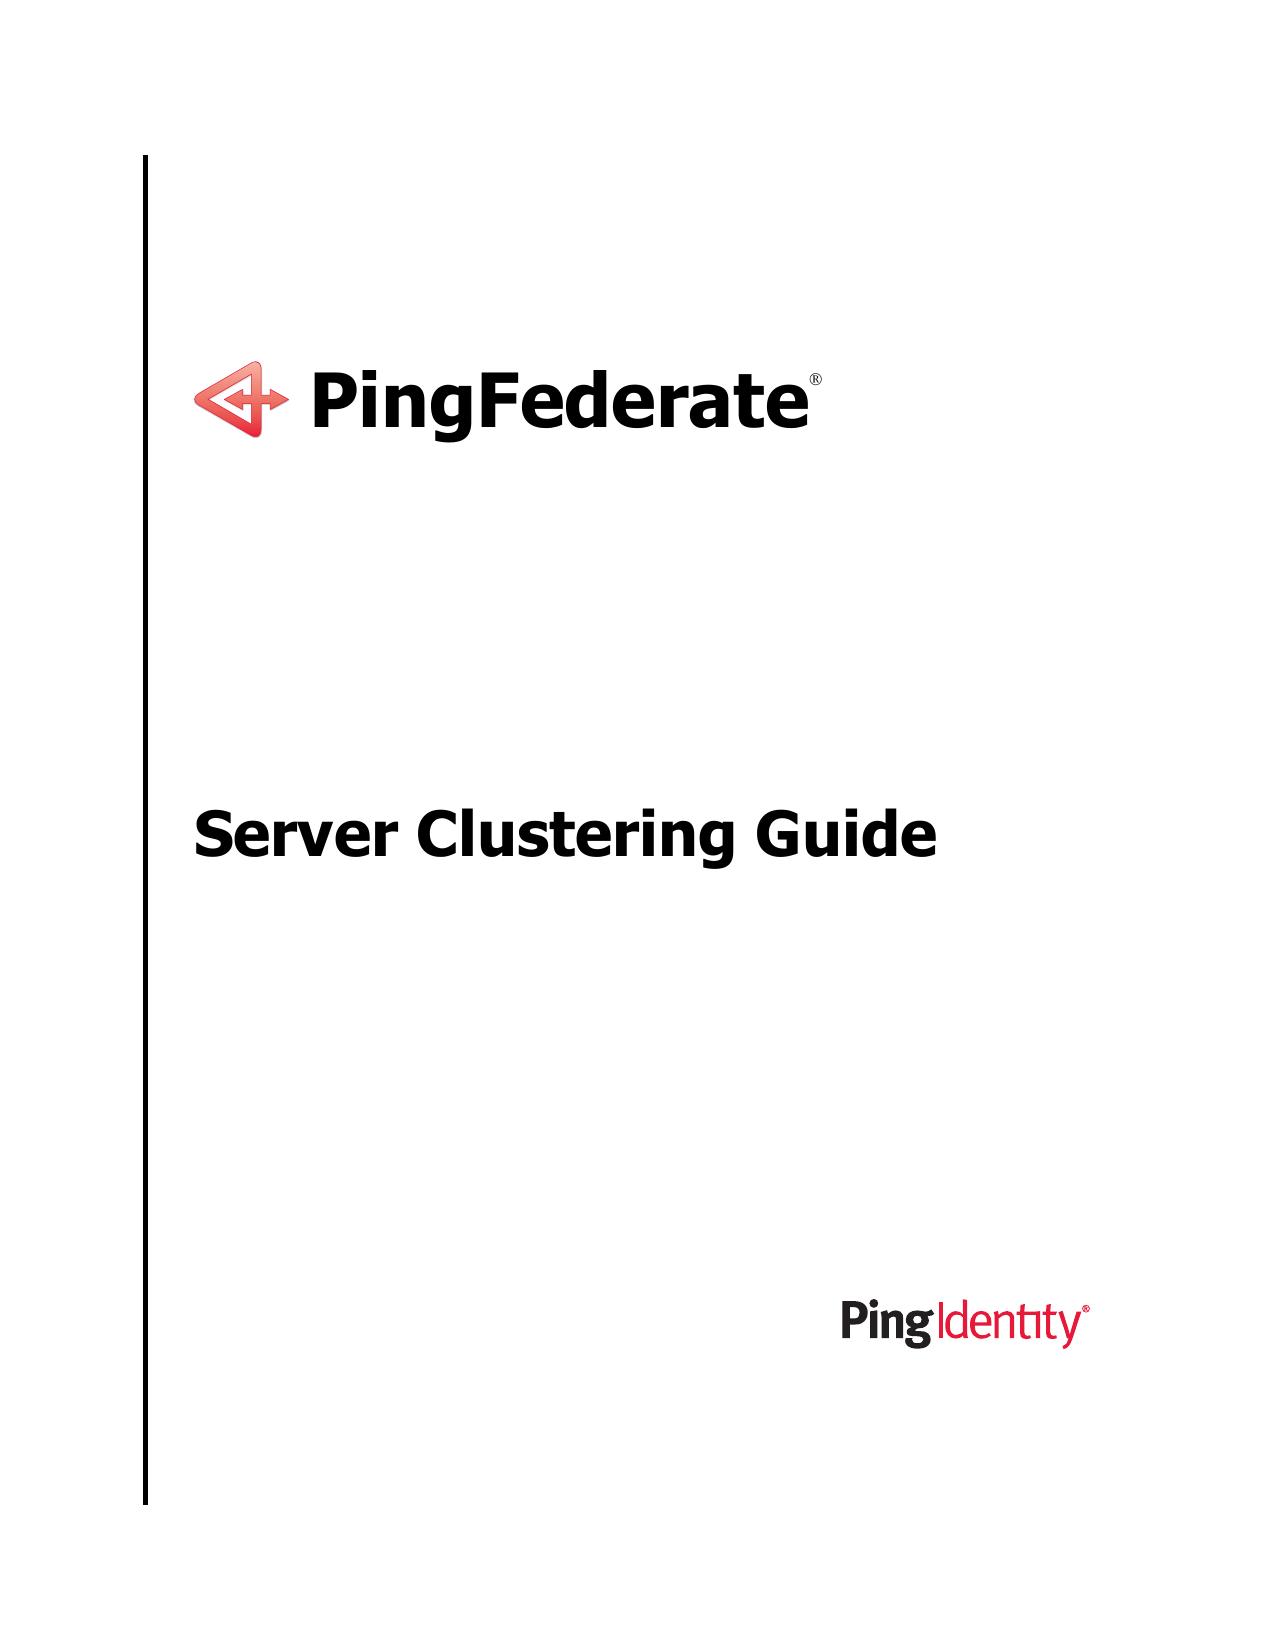 PingFederate Server Clustering Guide | manualzz com